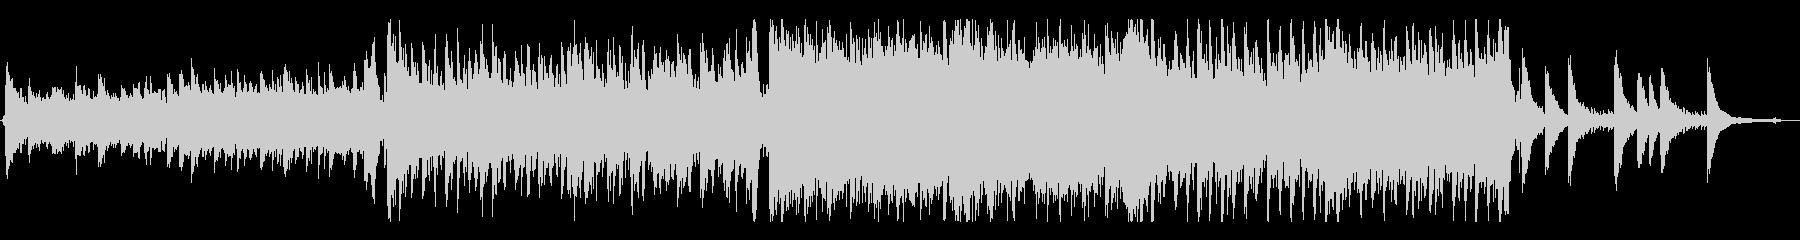 Epic/感動的でUpliftingな曲の未再生の波形